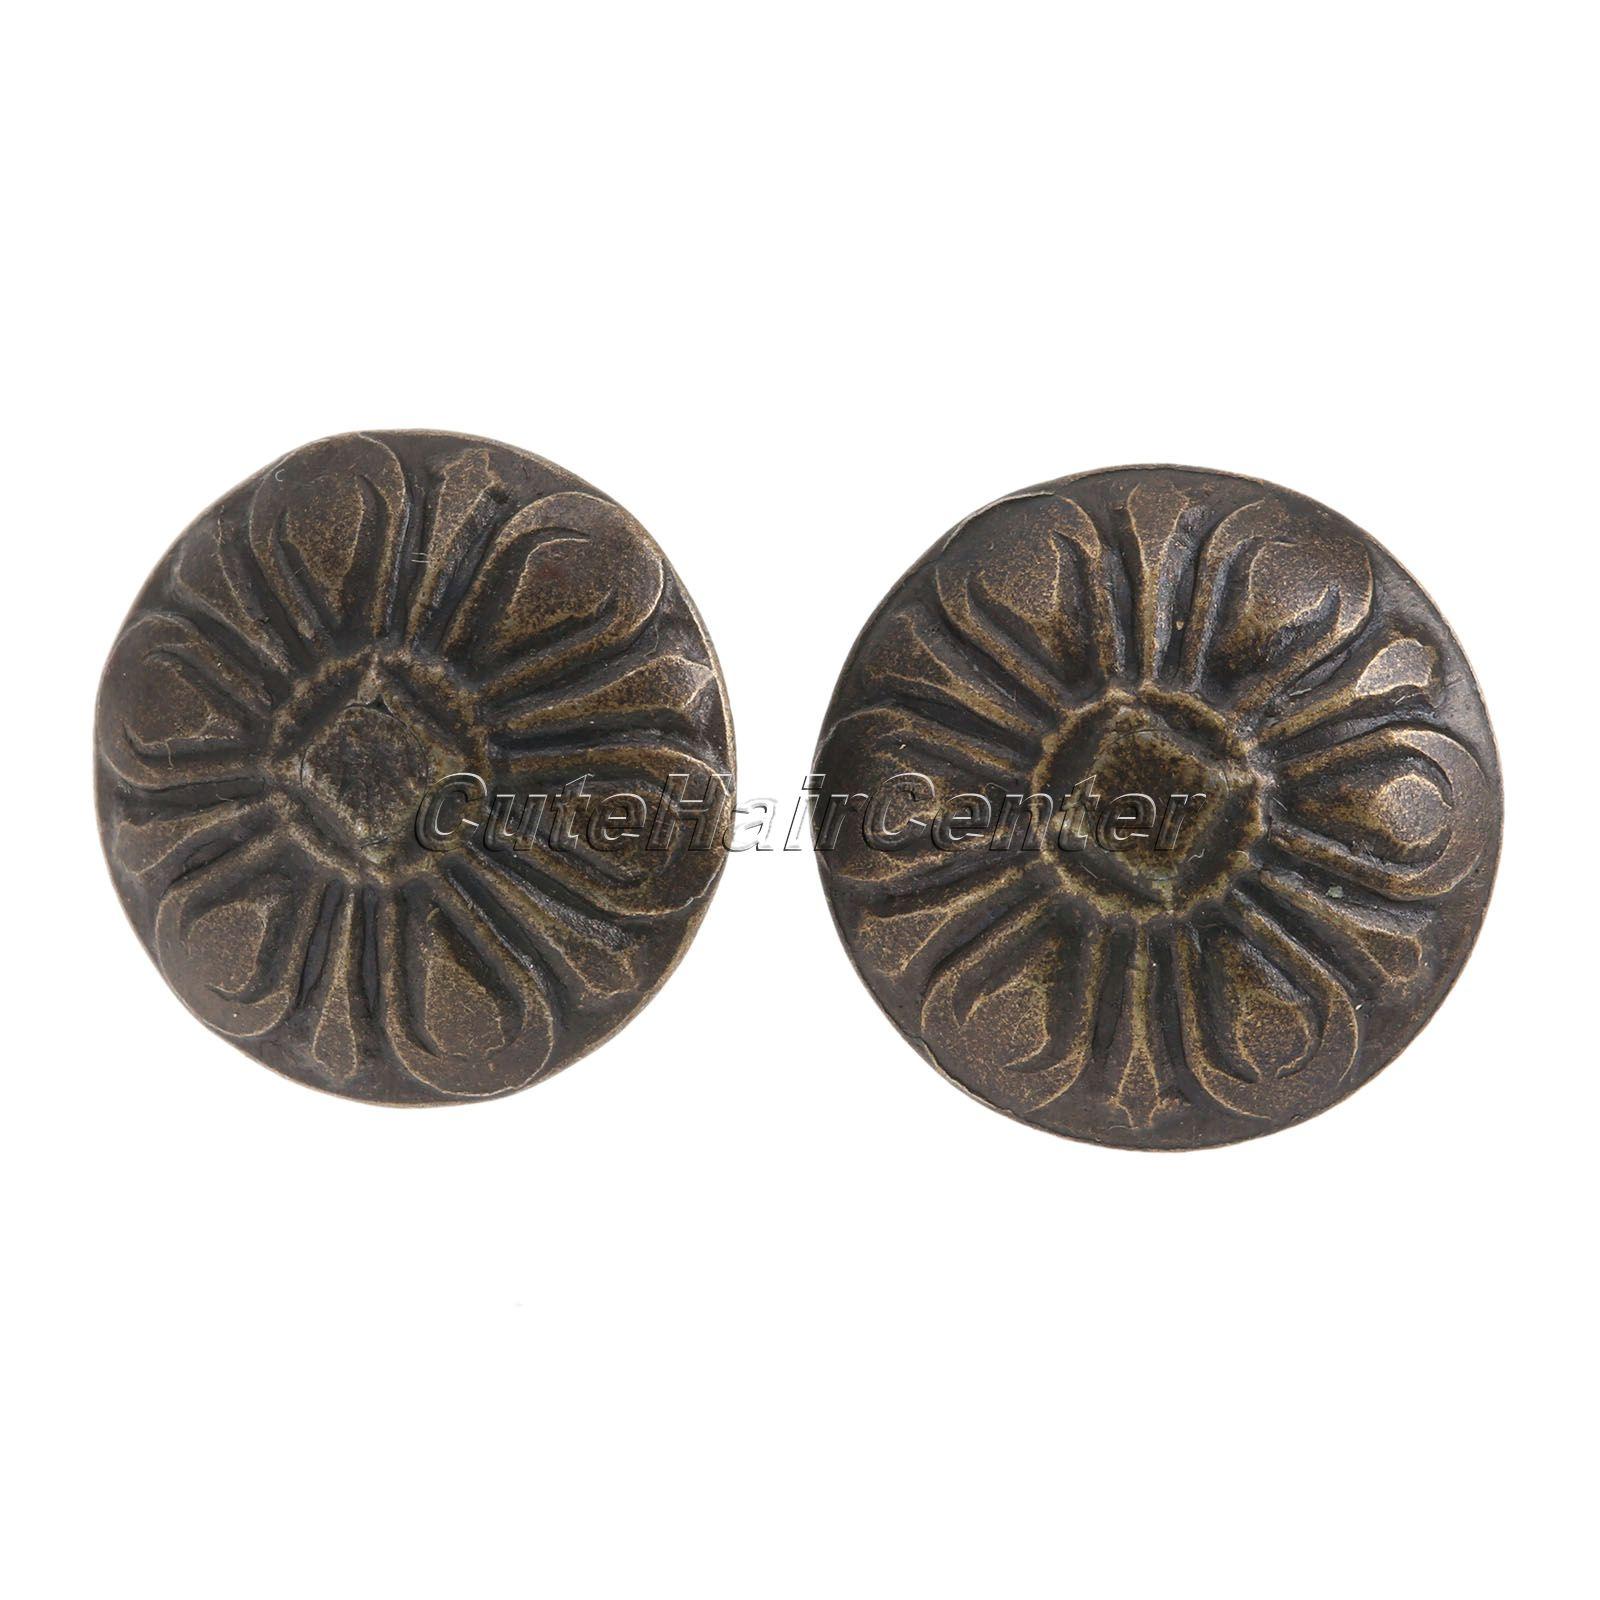 Hot Selling 100Pcs Iron <font><b>Elegant</b></font> Bronze Upholstery Nails Tacks Studs Vintage Style Furniture Fix For <font><b>Home</b></font> <font><b>Decoration</b></font>